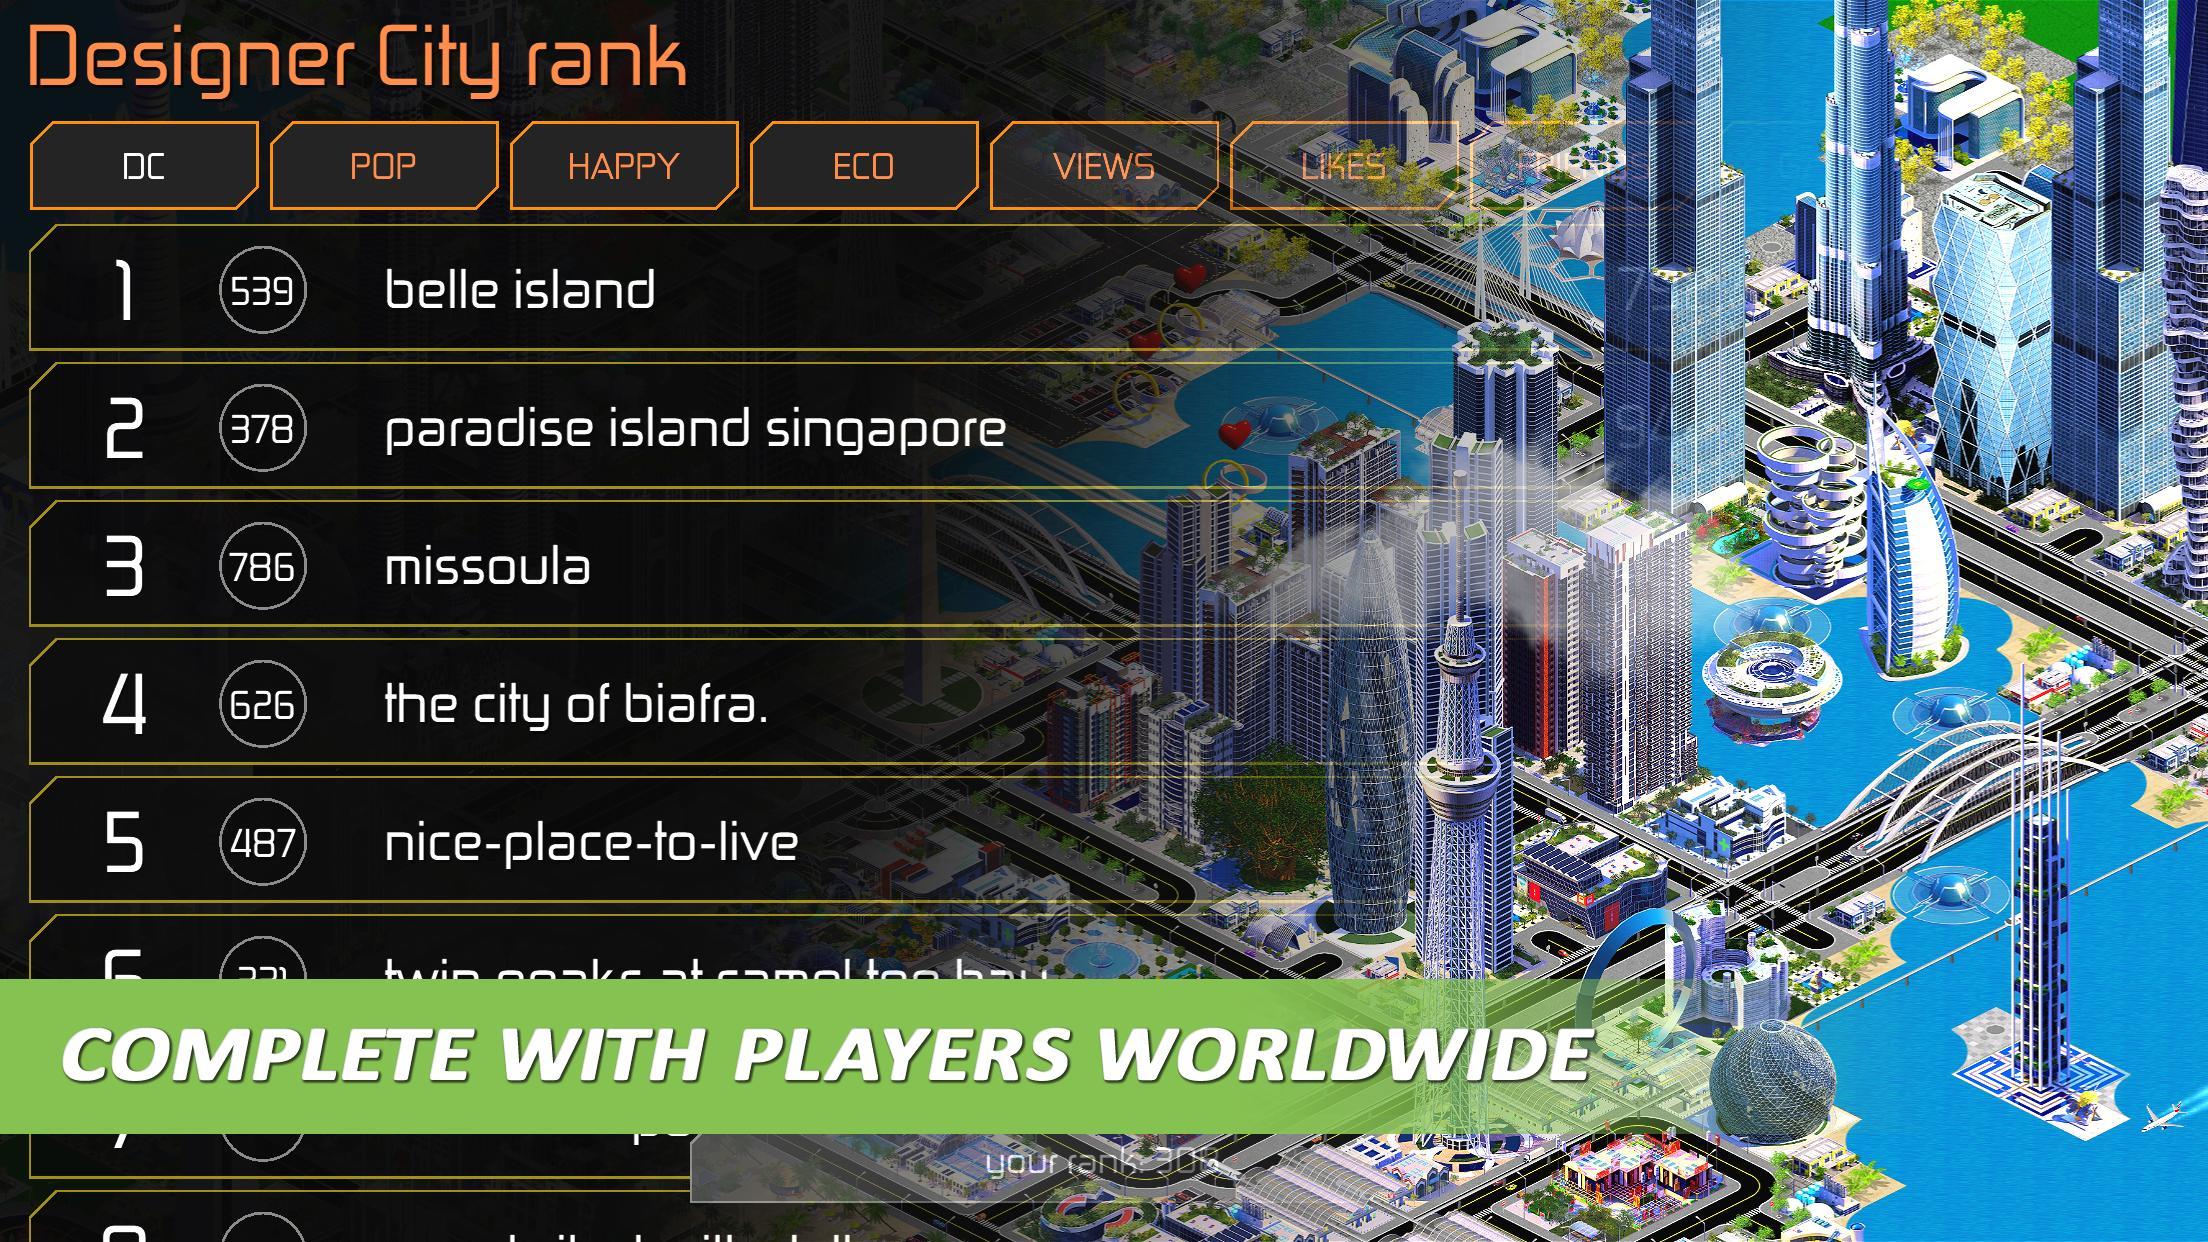 Designer City for Android - APK Download